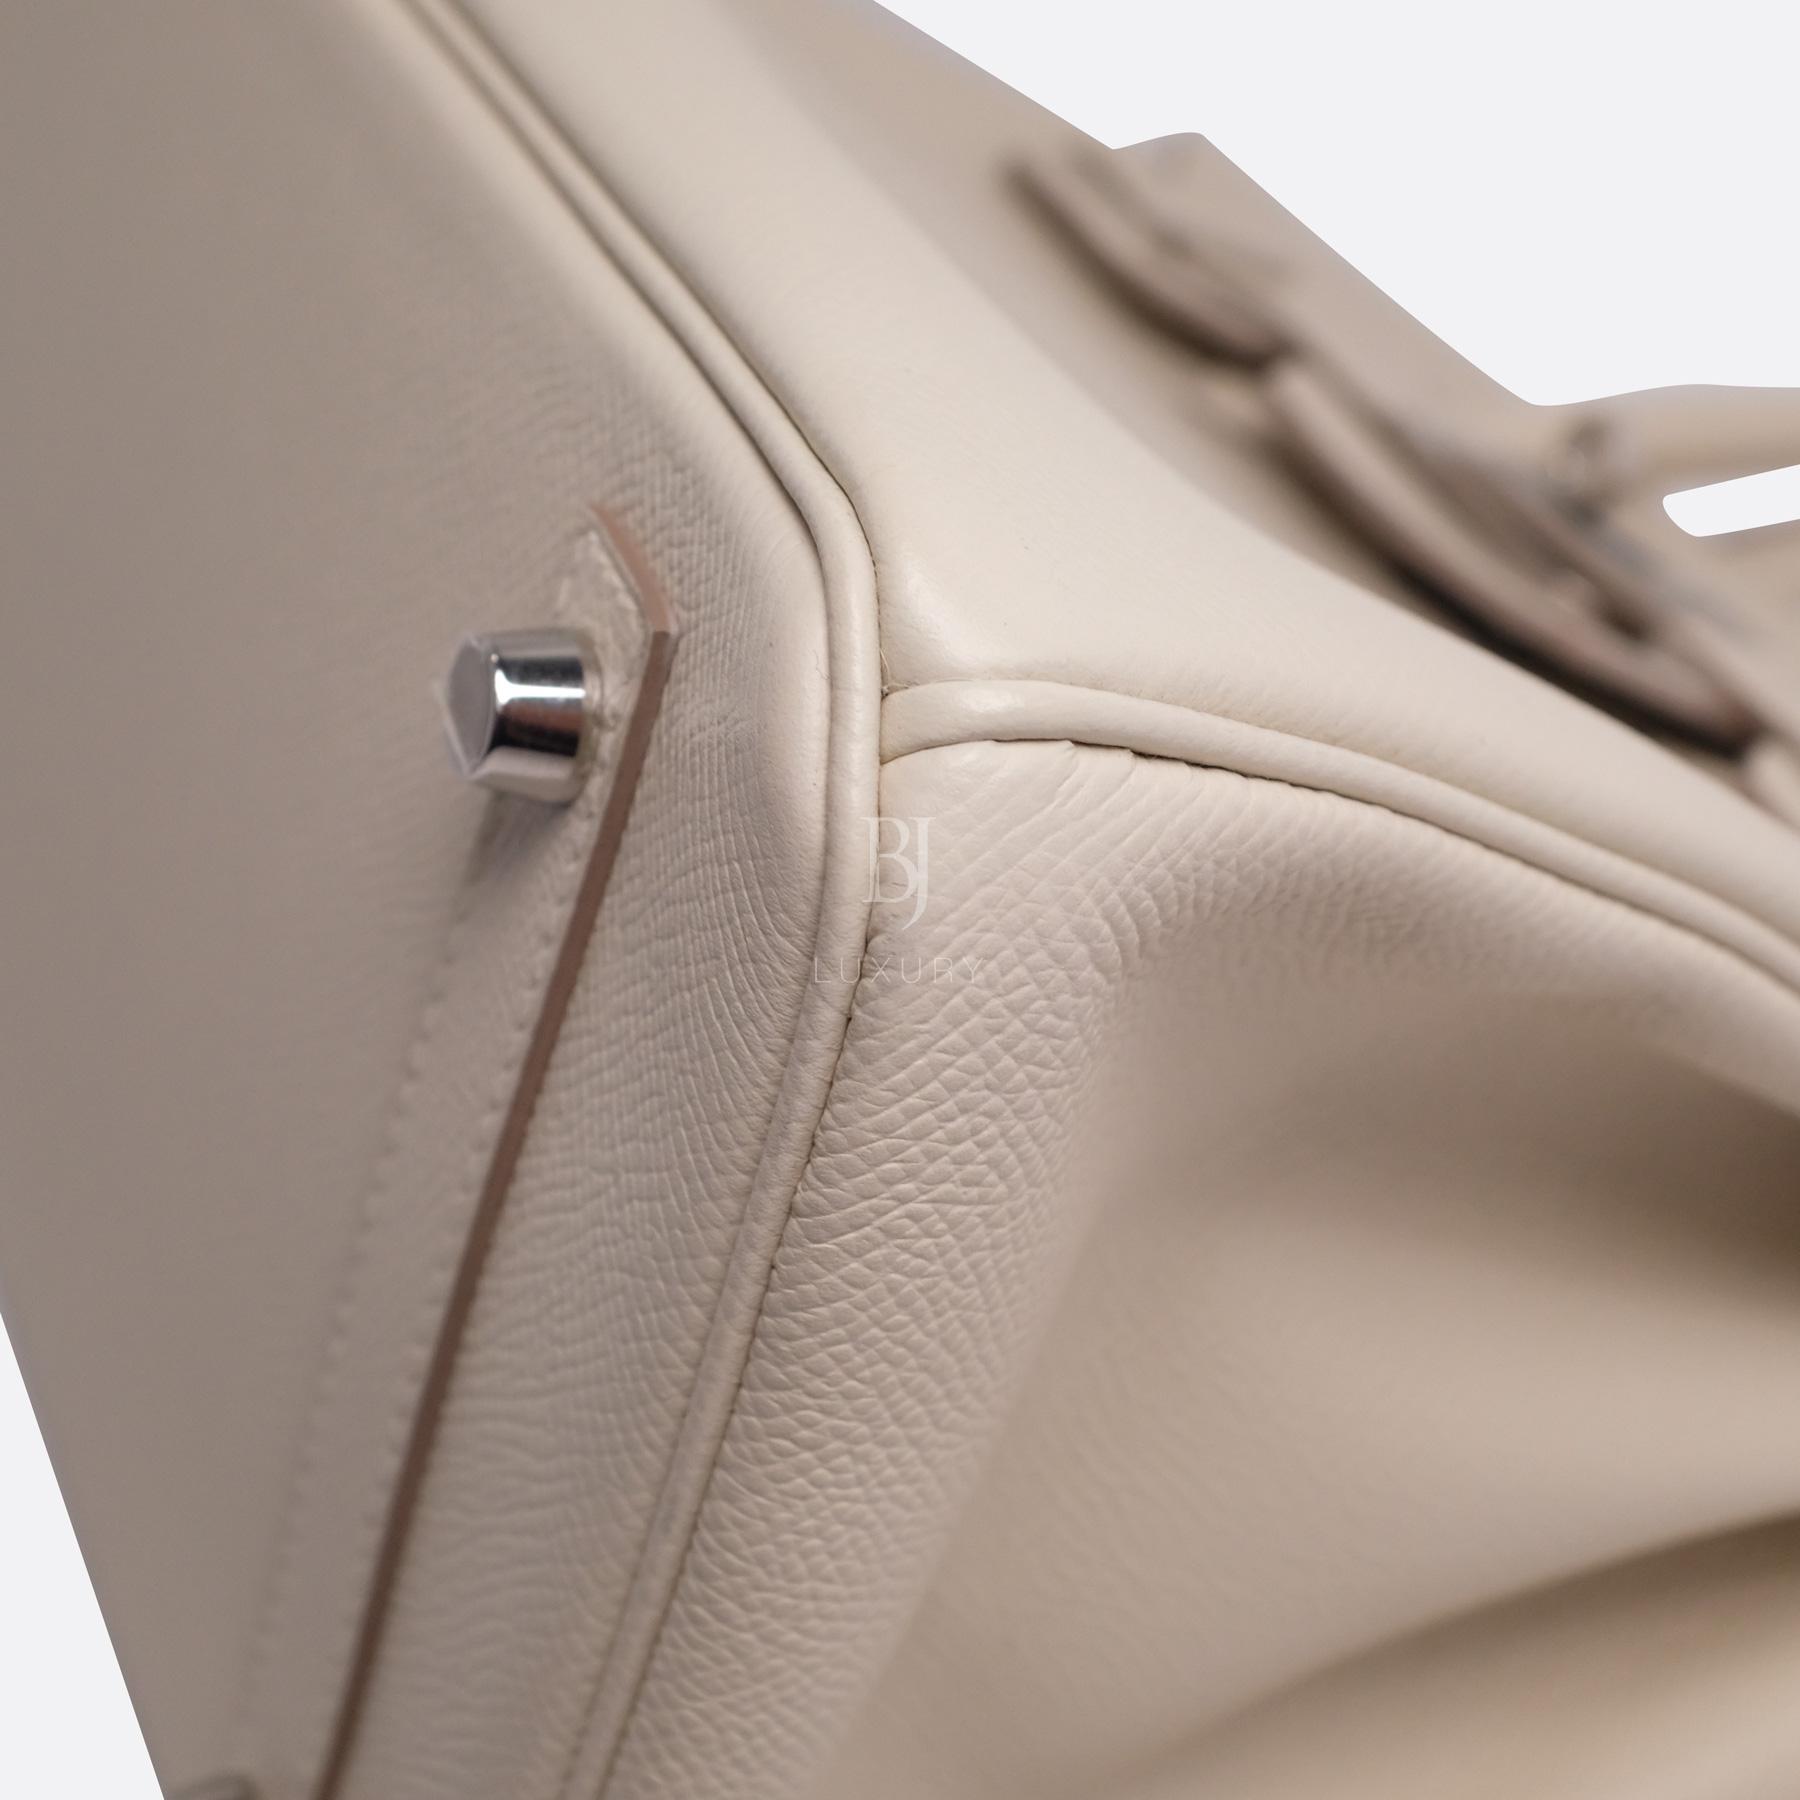 Hermes Birkin 30 Epsom Craie Palladium BJ Luxury 14.jpg